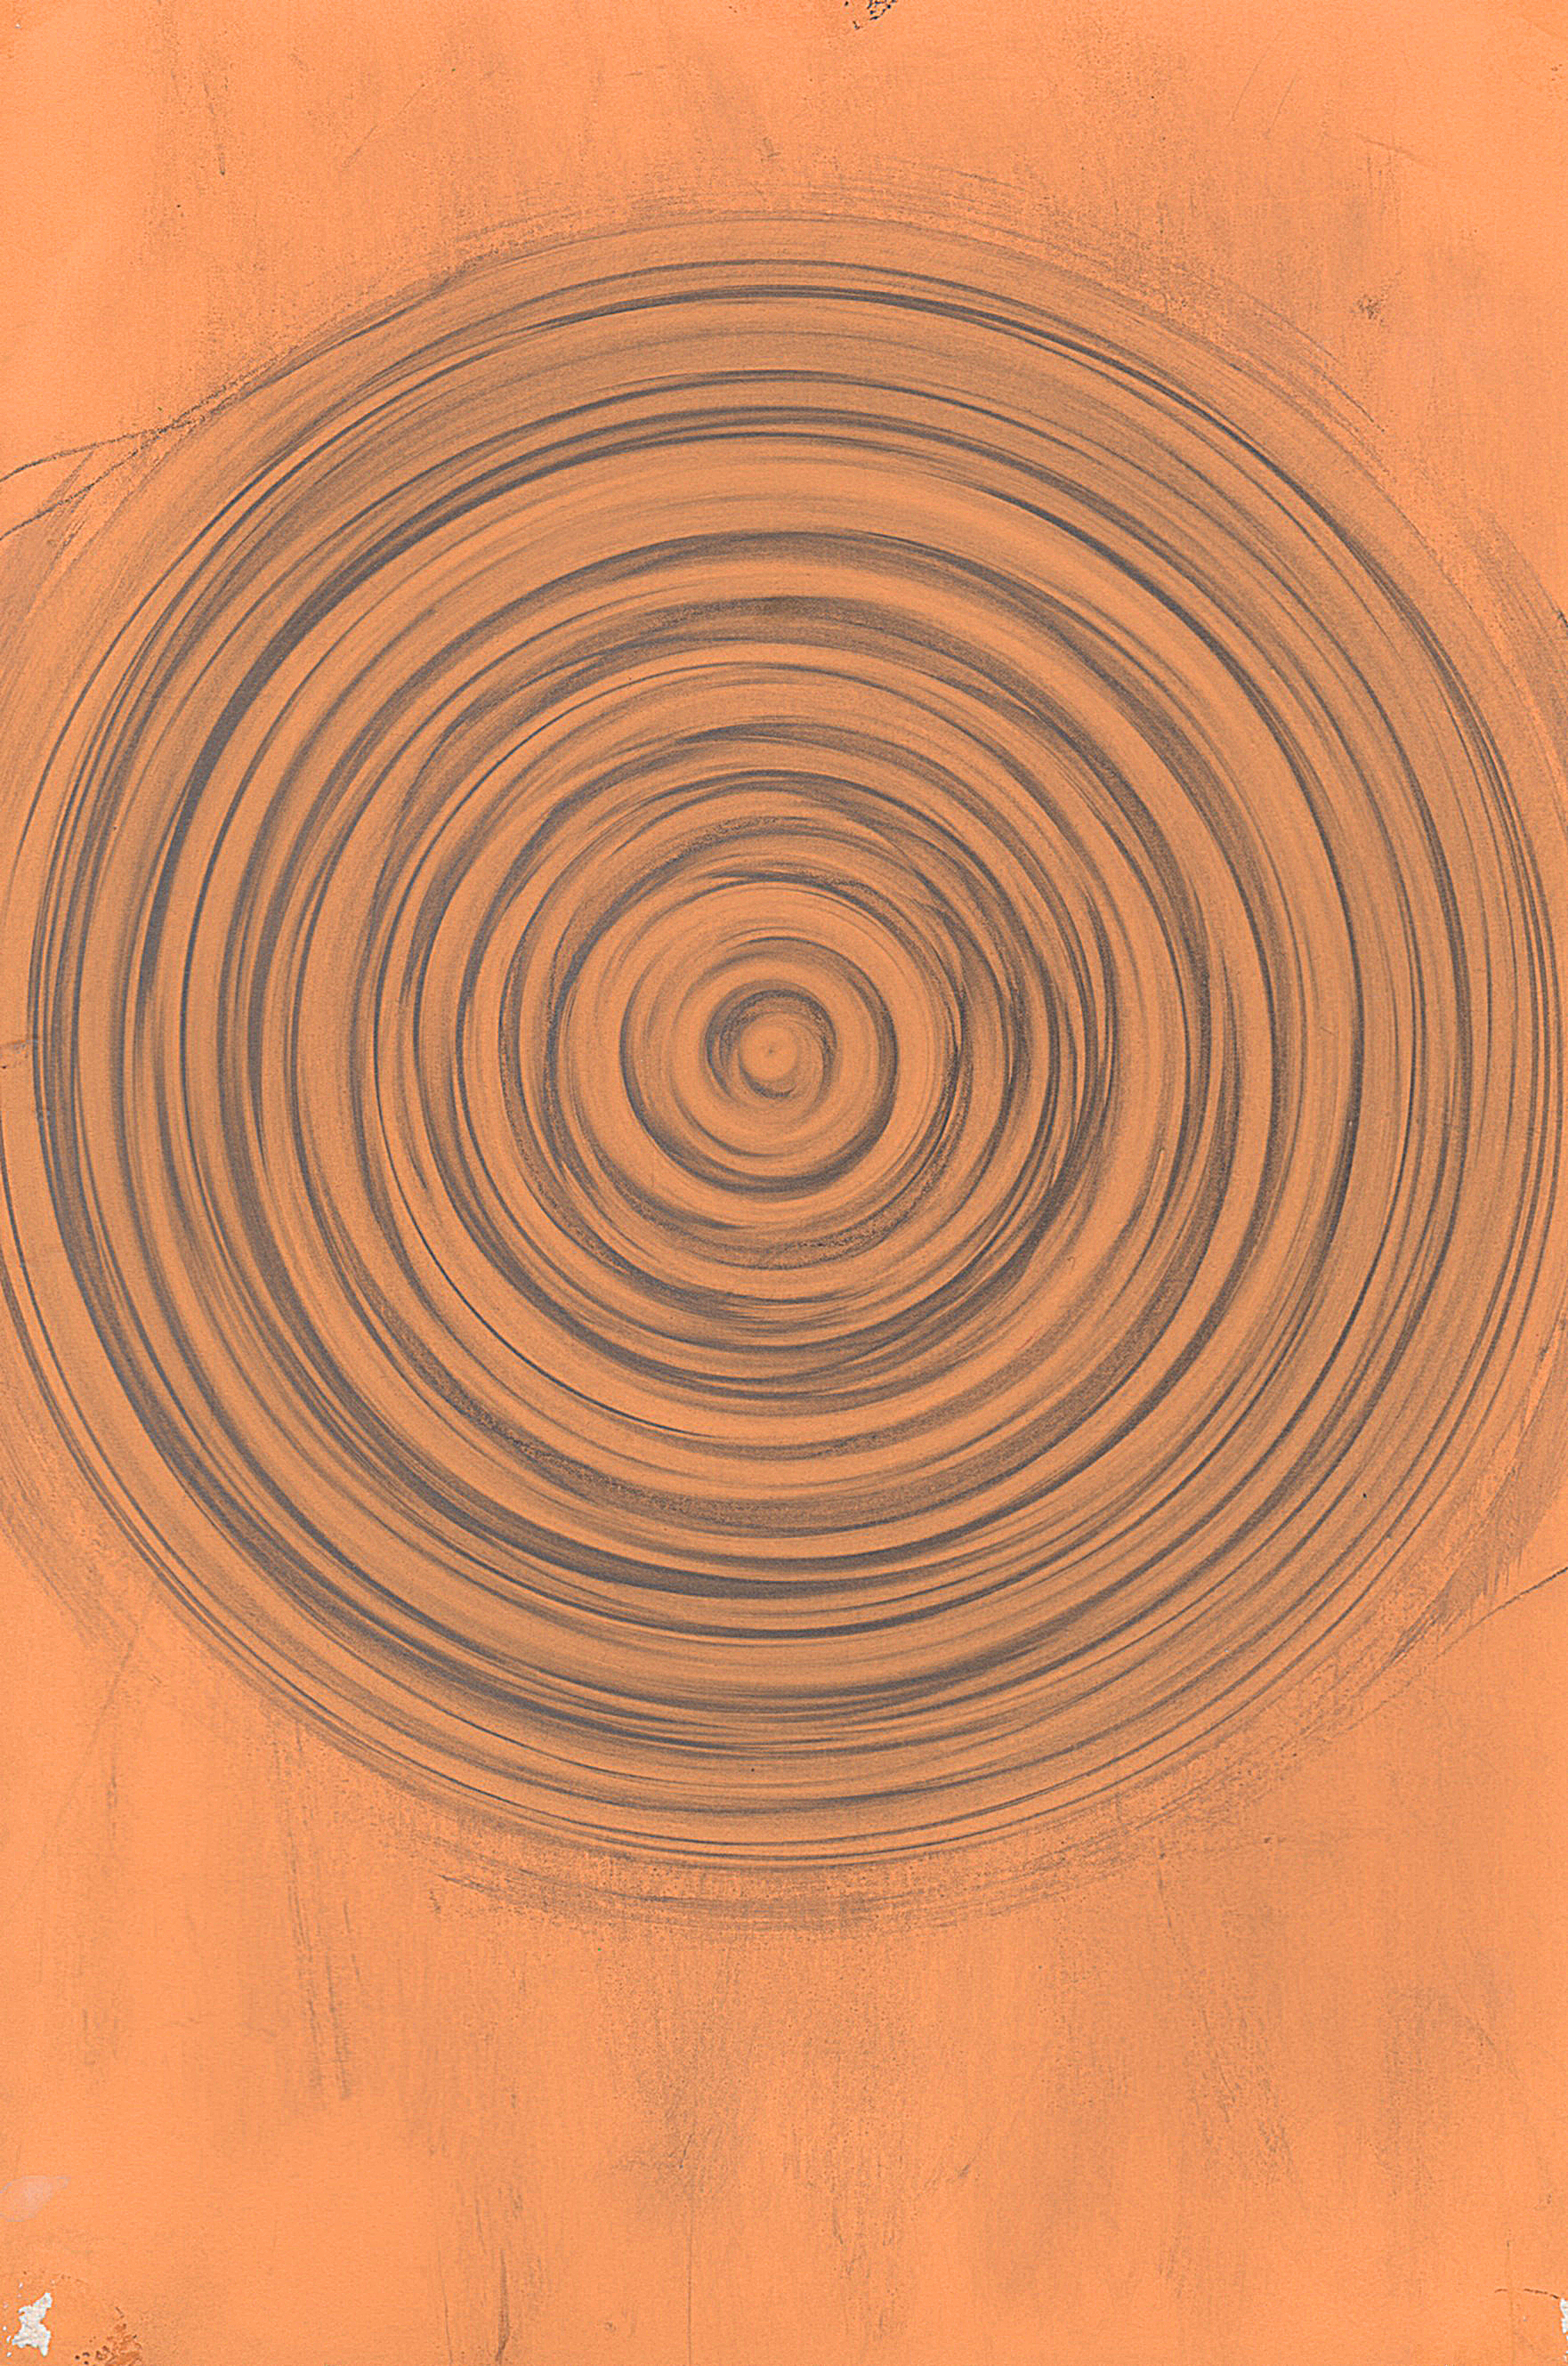 flowchart 16,  2012  graphite on paper, 7 x 5 in